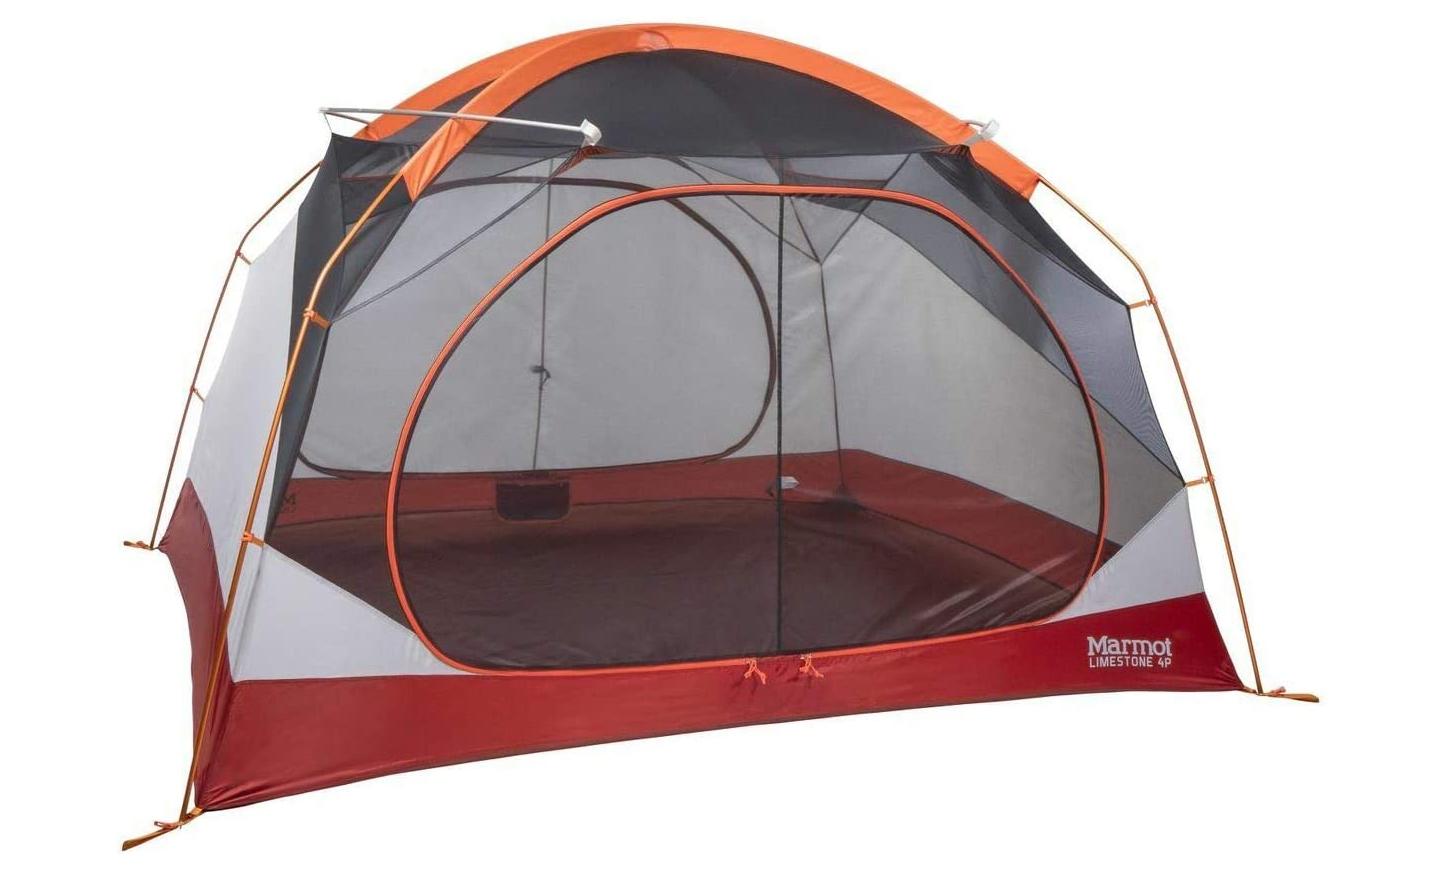 Marmot Limestone 4 Person Car Camping Tent